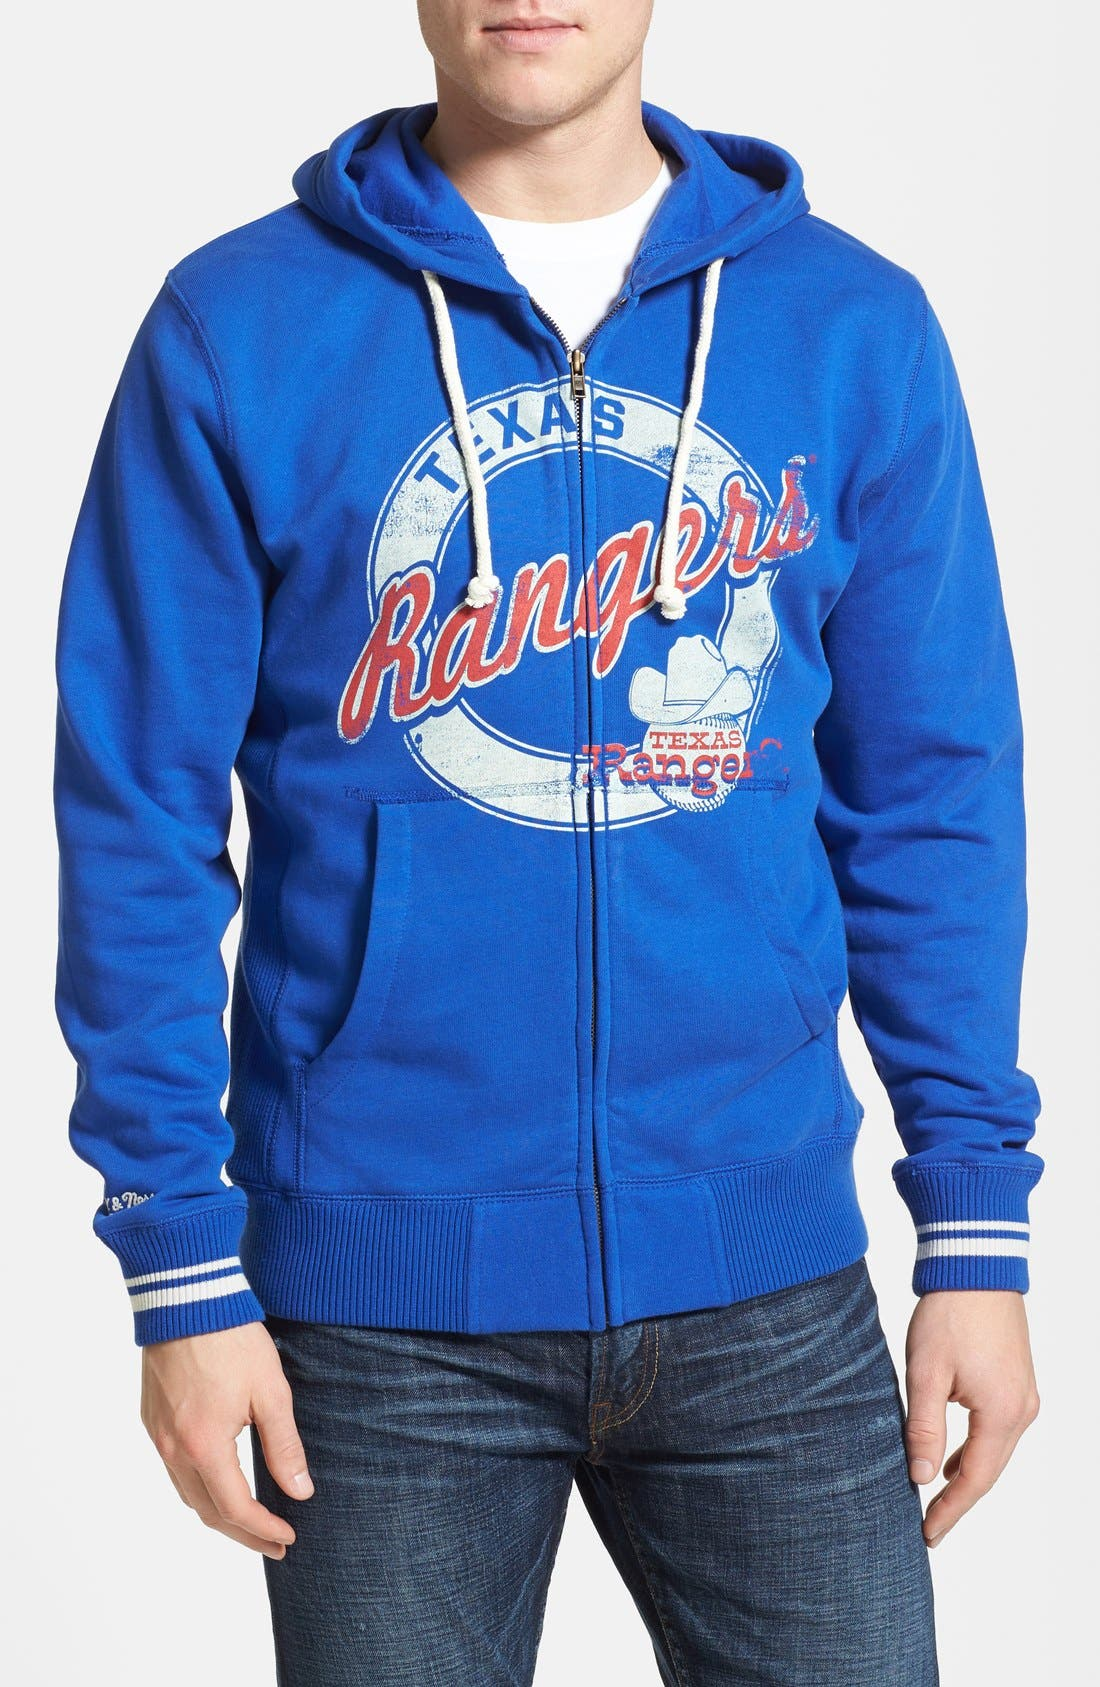 Alternate Image 1 Selected - Mitchell & Ness 'Texas Rangers' Full Zip Hoodie